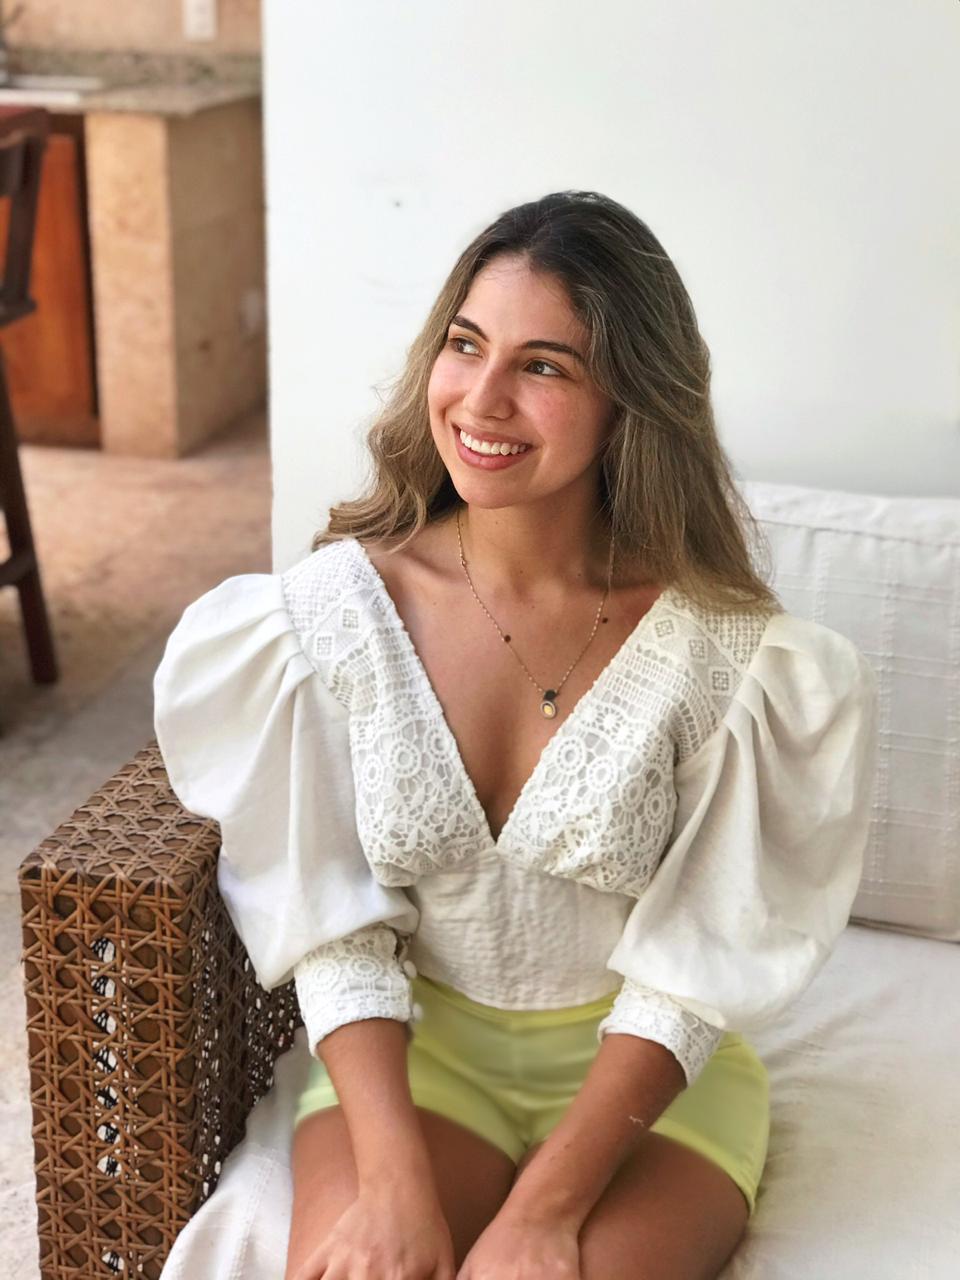 blusa-taliana-con-mangas-abullonadas-y-lazo-fabricada-en-lino-olan-con-guipu